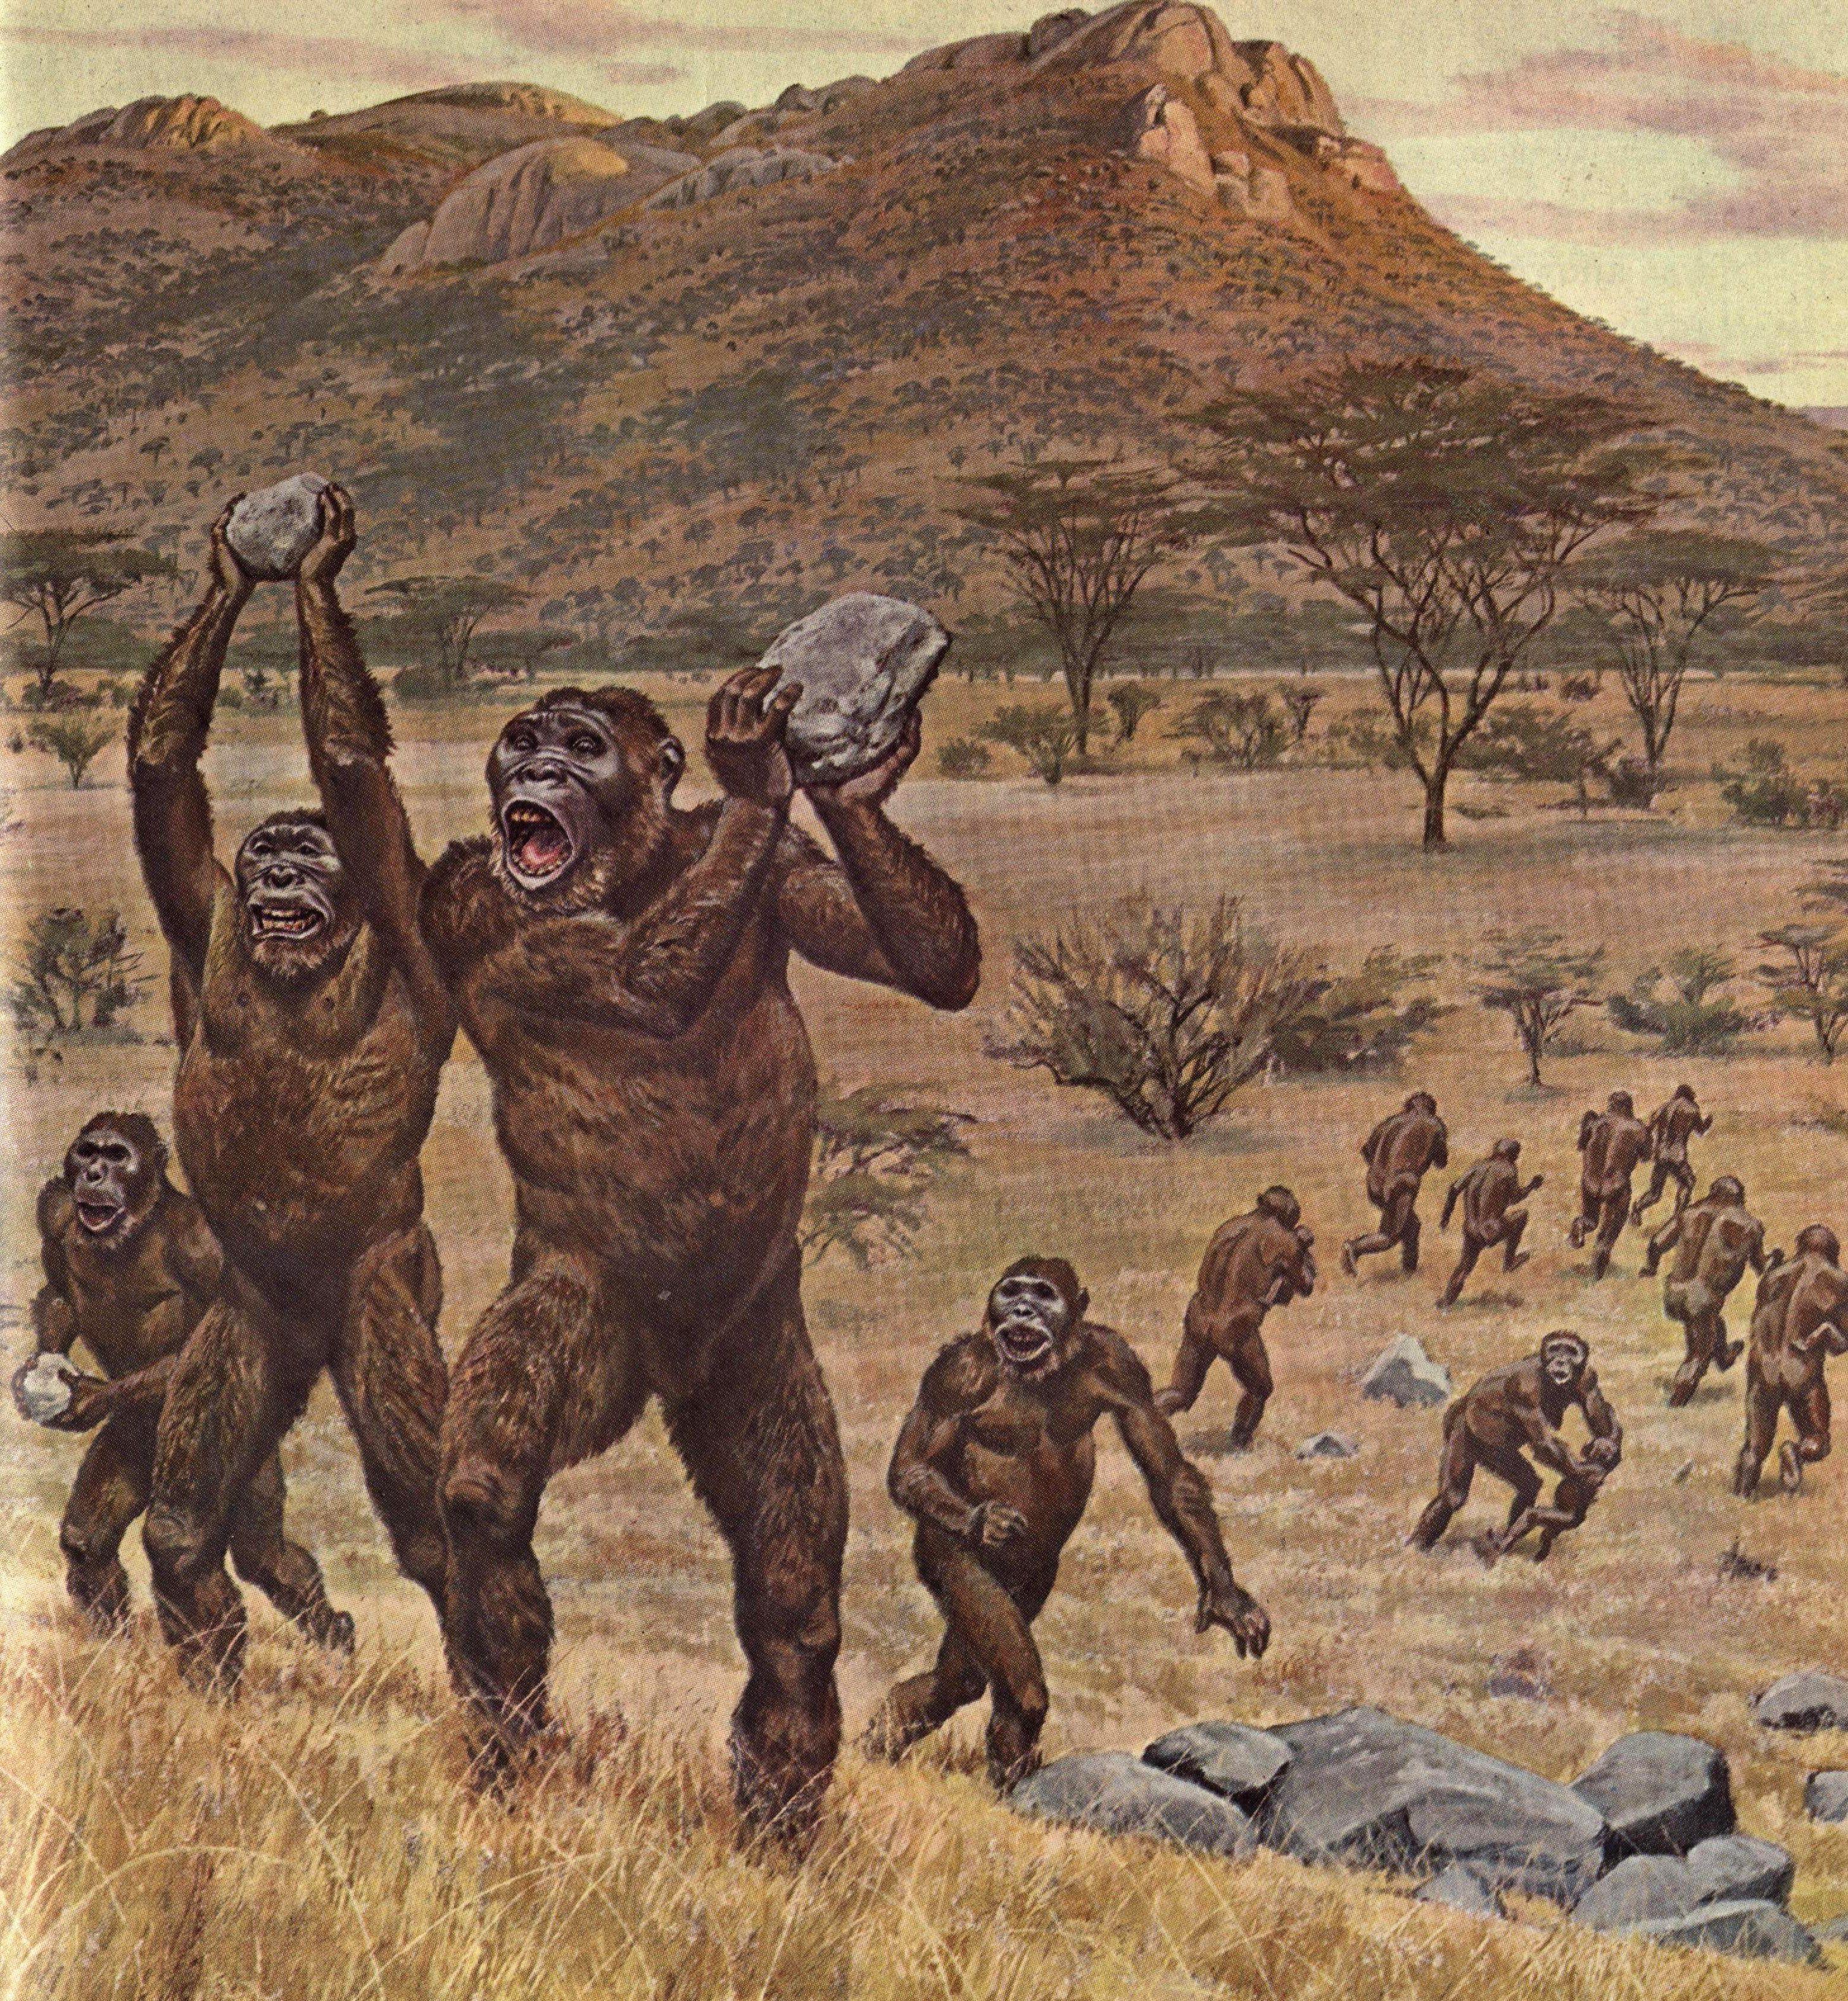 Paranthropus Robustus By Jay Matternes